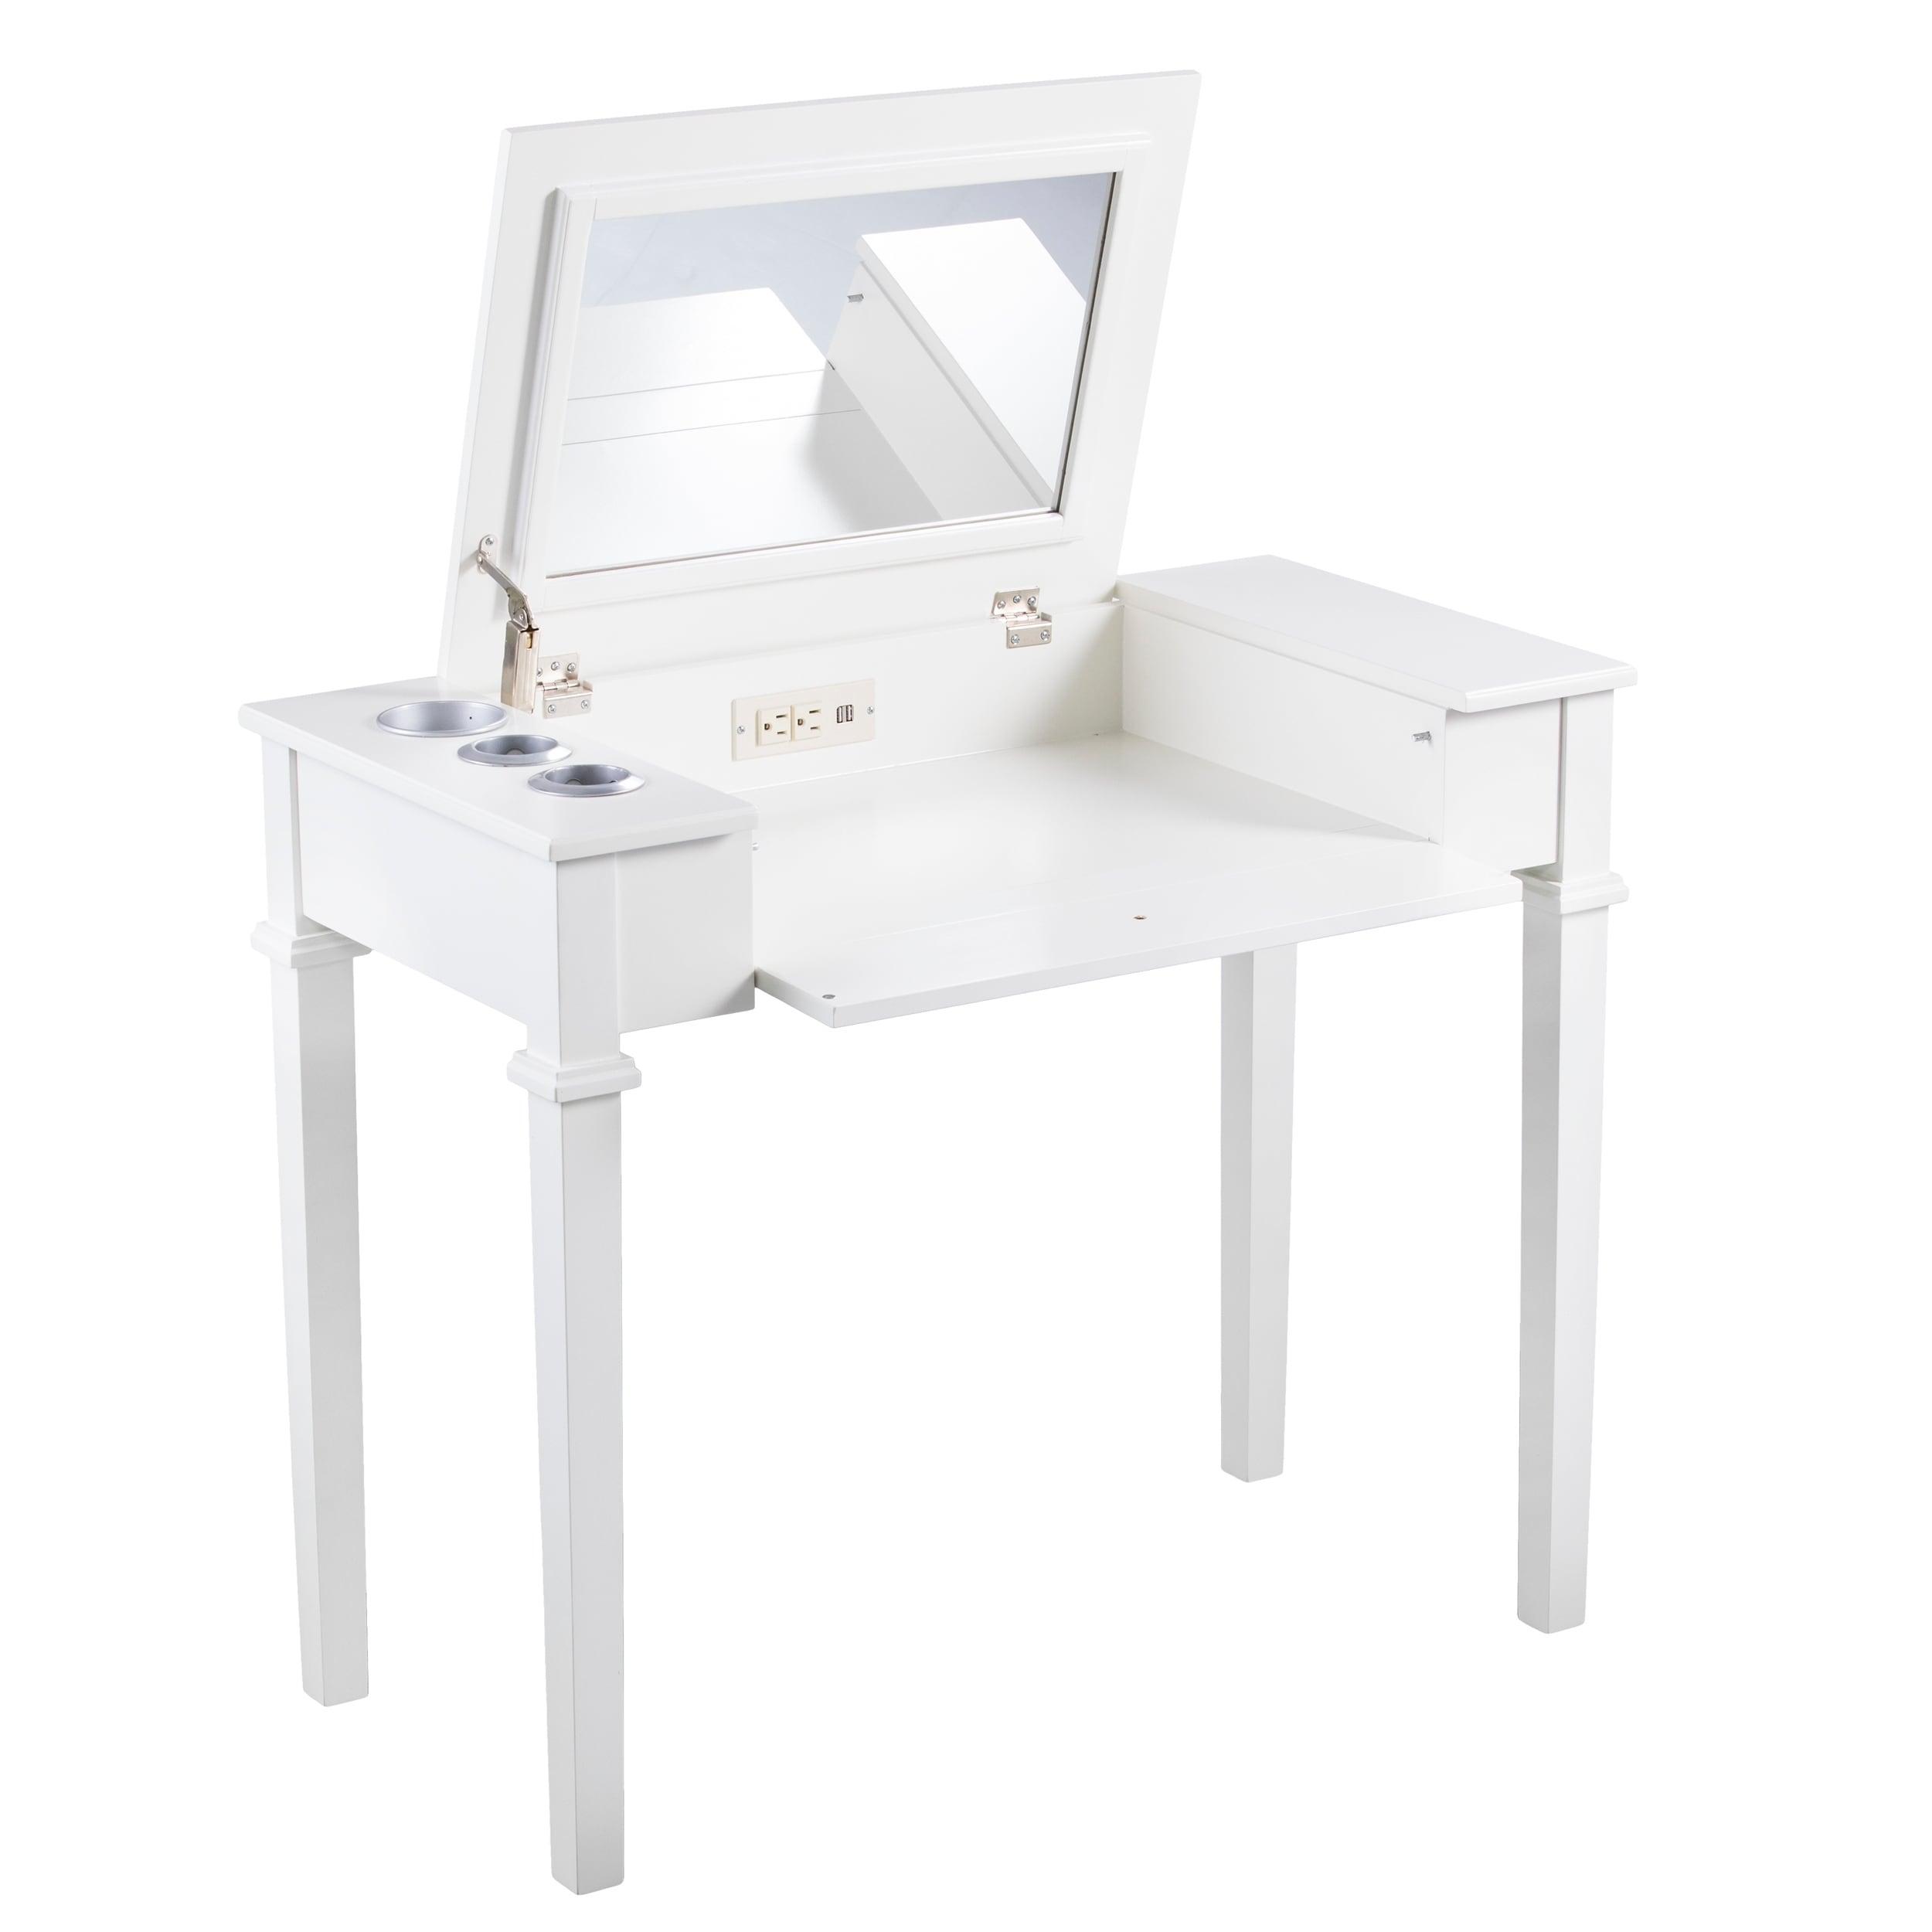 off white vanity table. Harper Blvd Rovelto Off White Powered Vanity Desk W  Stool Free Shipping Today Overstock 26181297